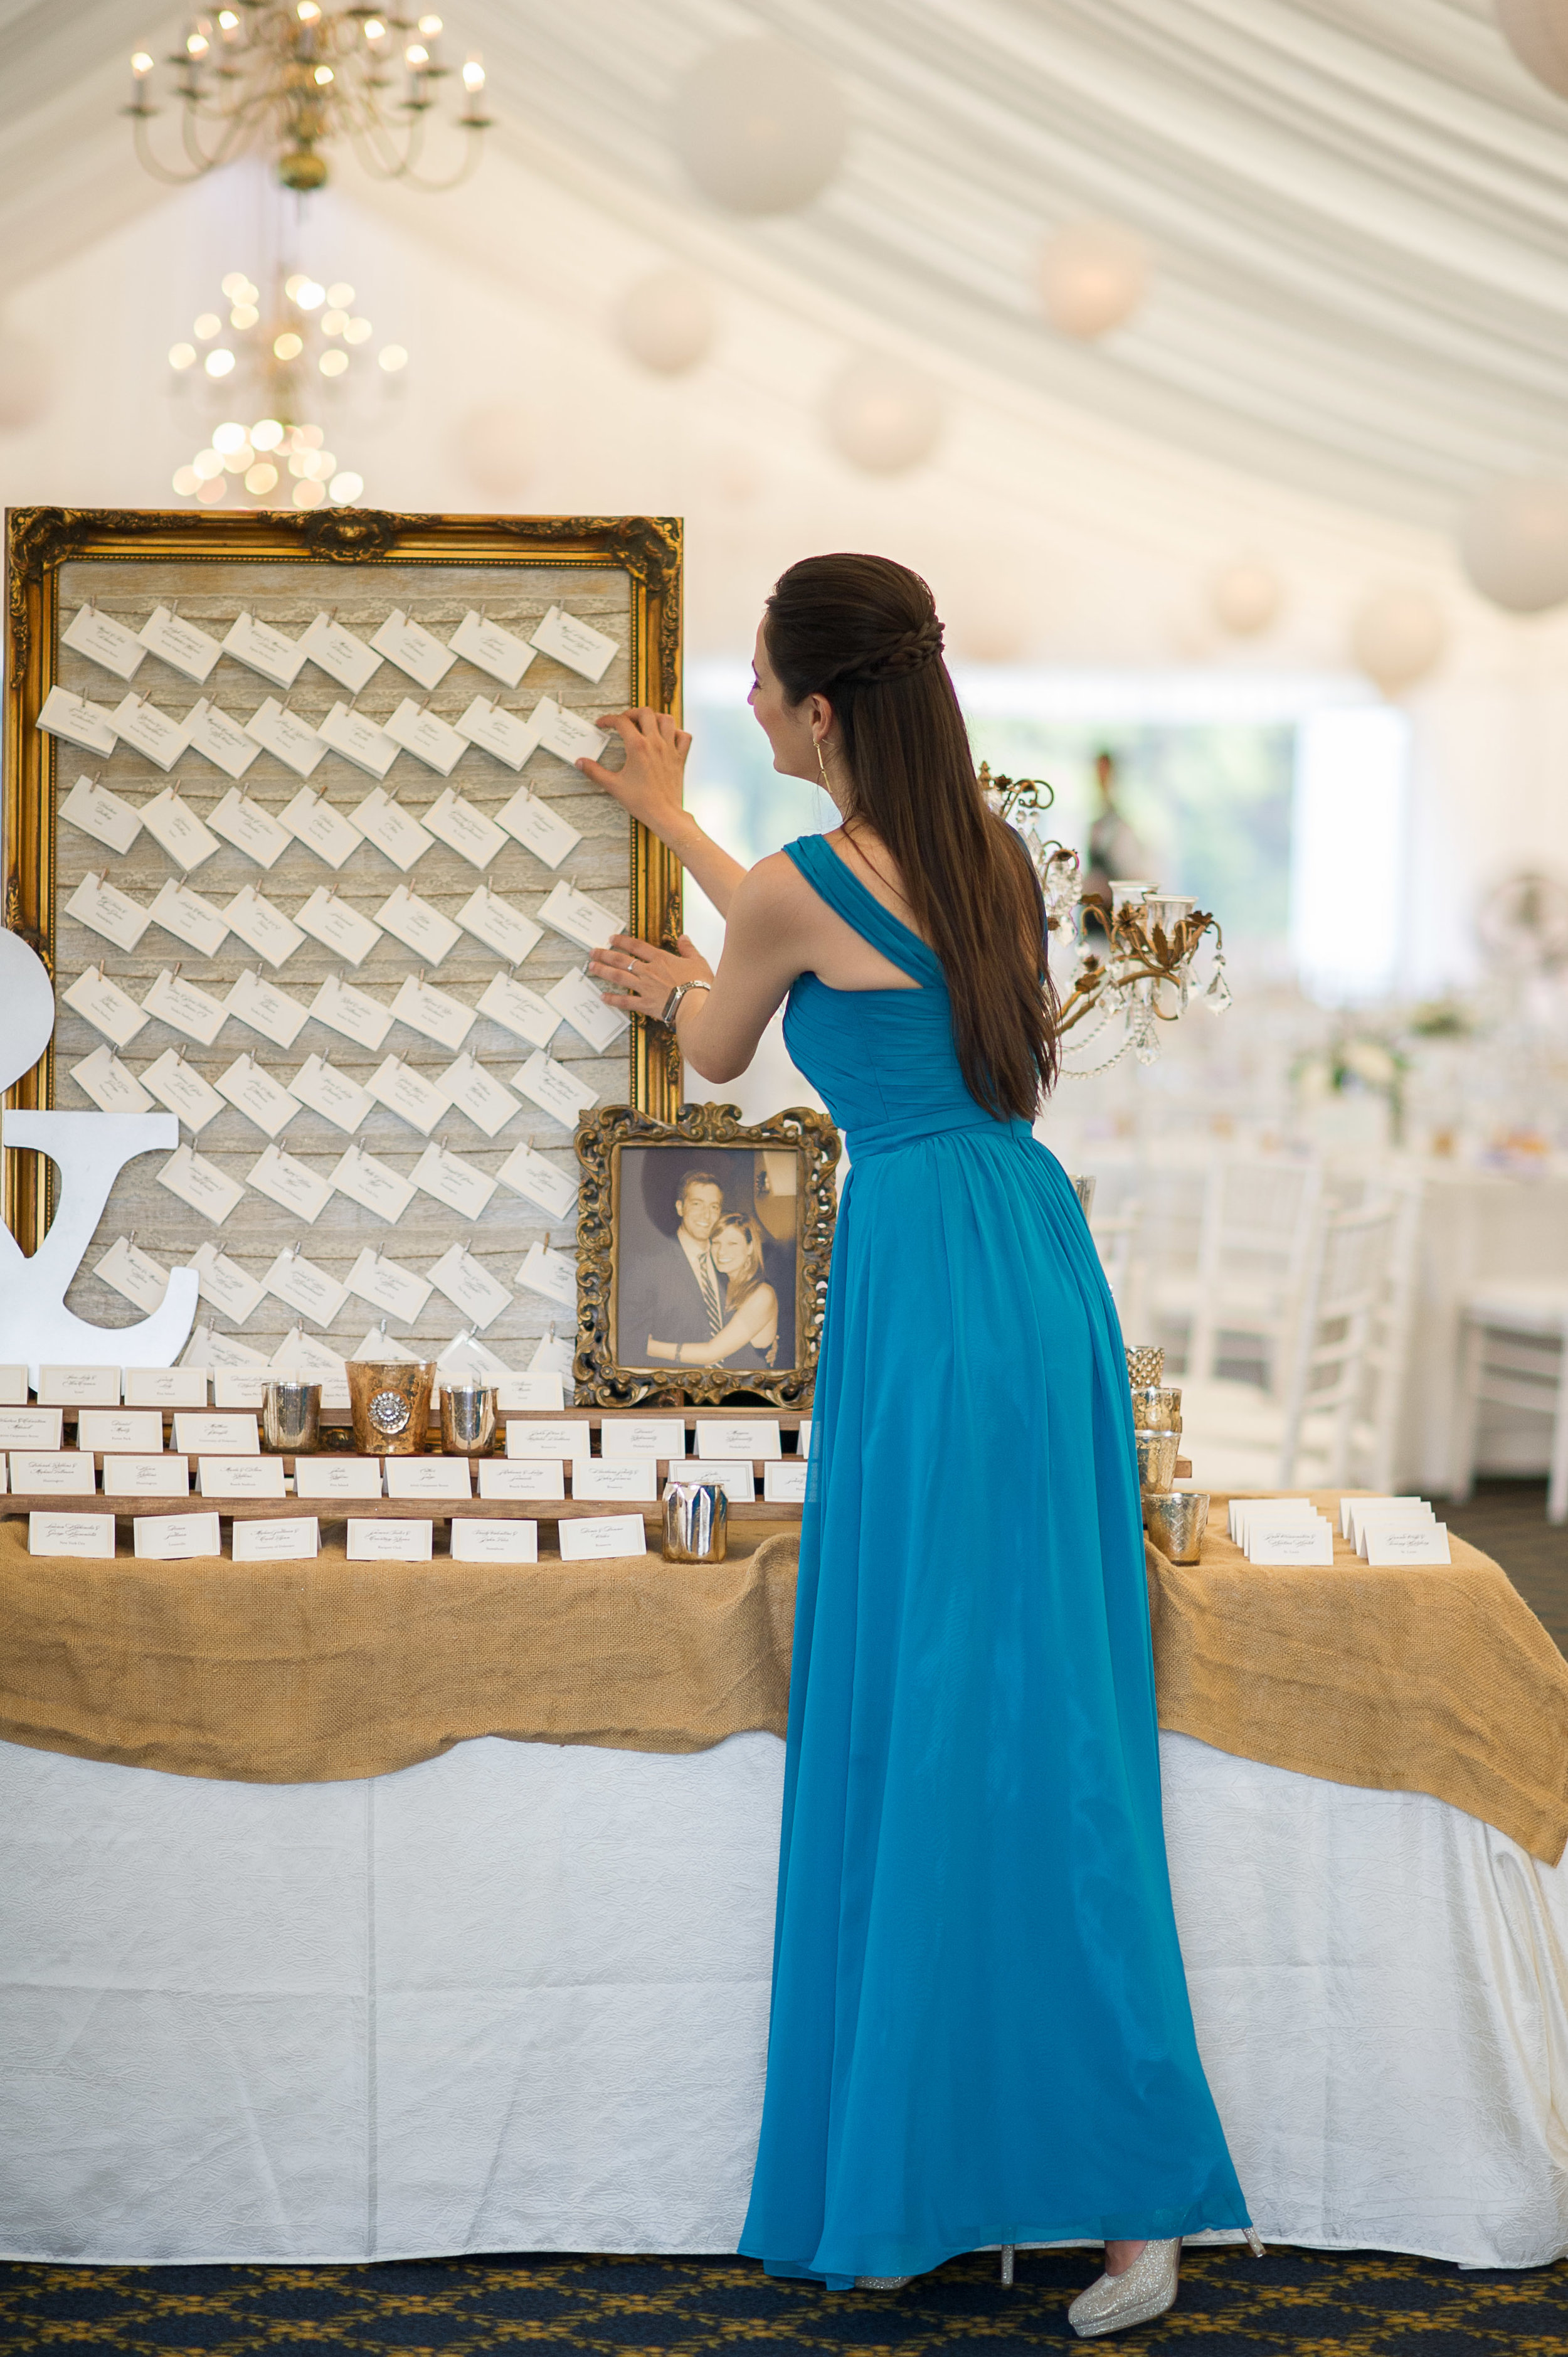 brandywine-wedding-tessie-reveliotis-photography-beautiful-and-blessed-events-028